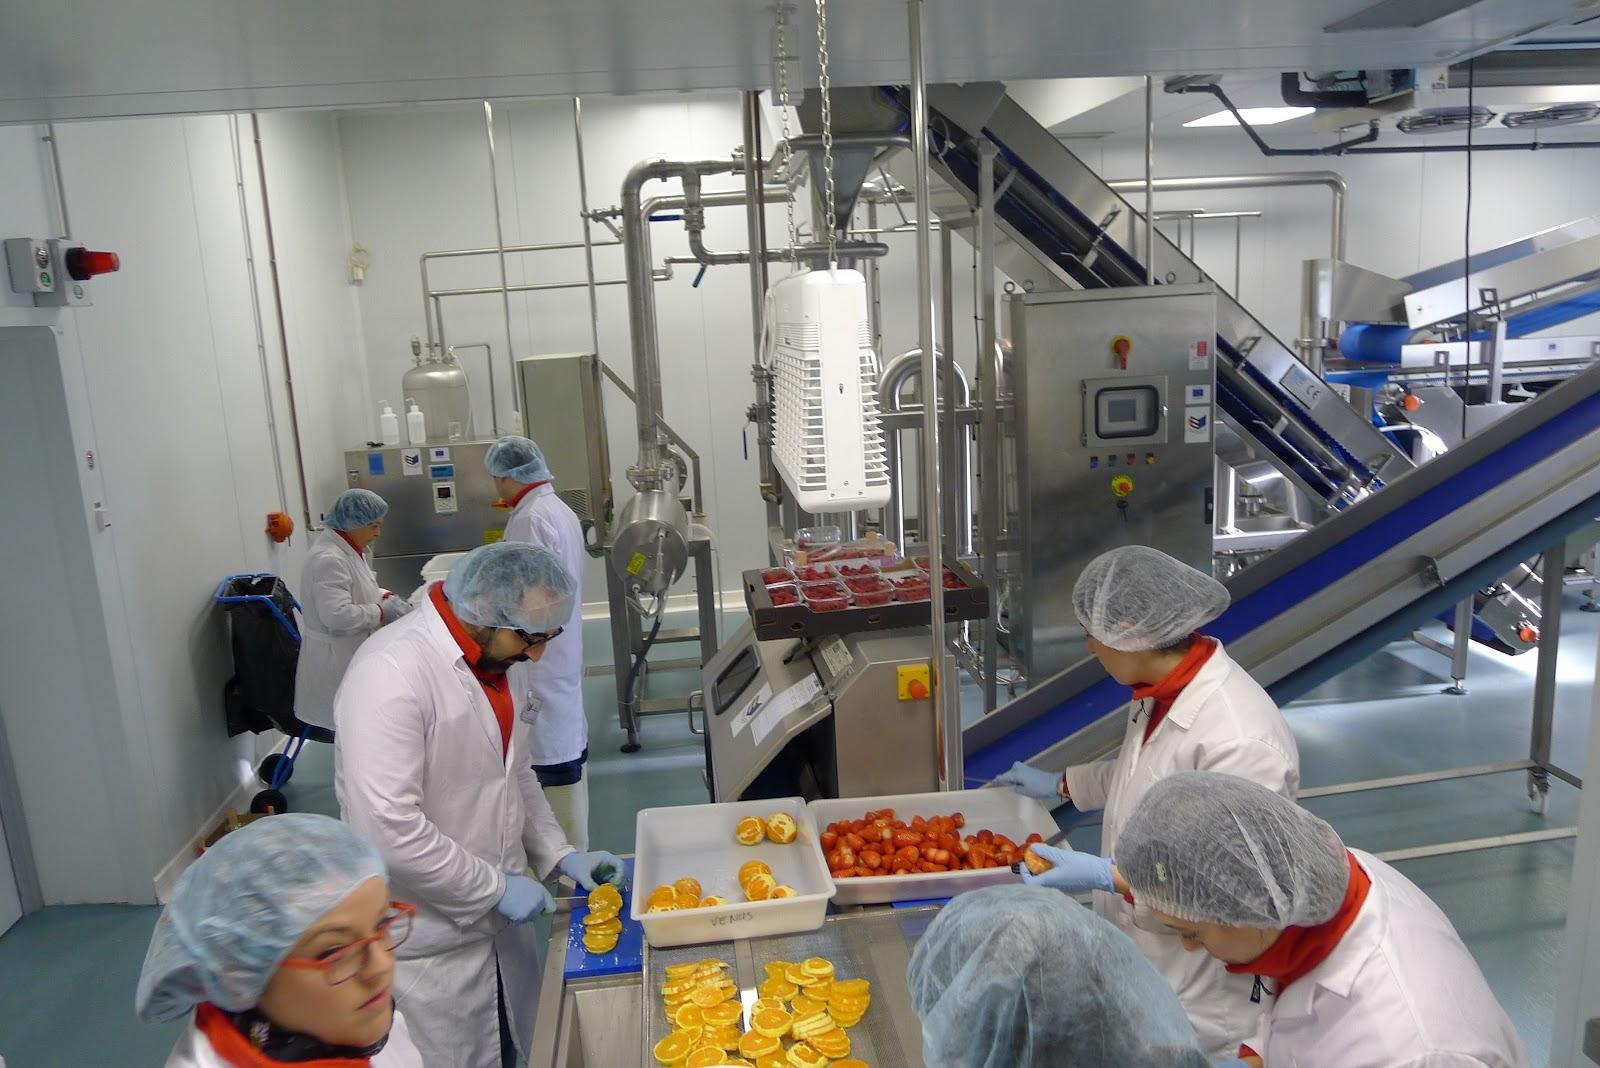 Tecnología de procesamiento de alimentos semiautomática o totalmente automática para producir rollos de carne rellenos